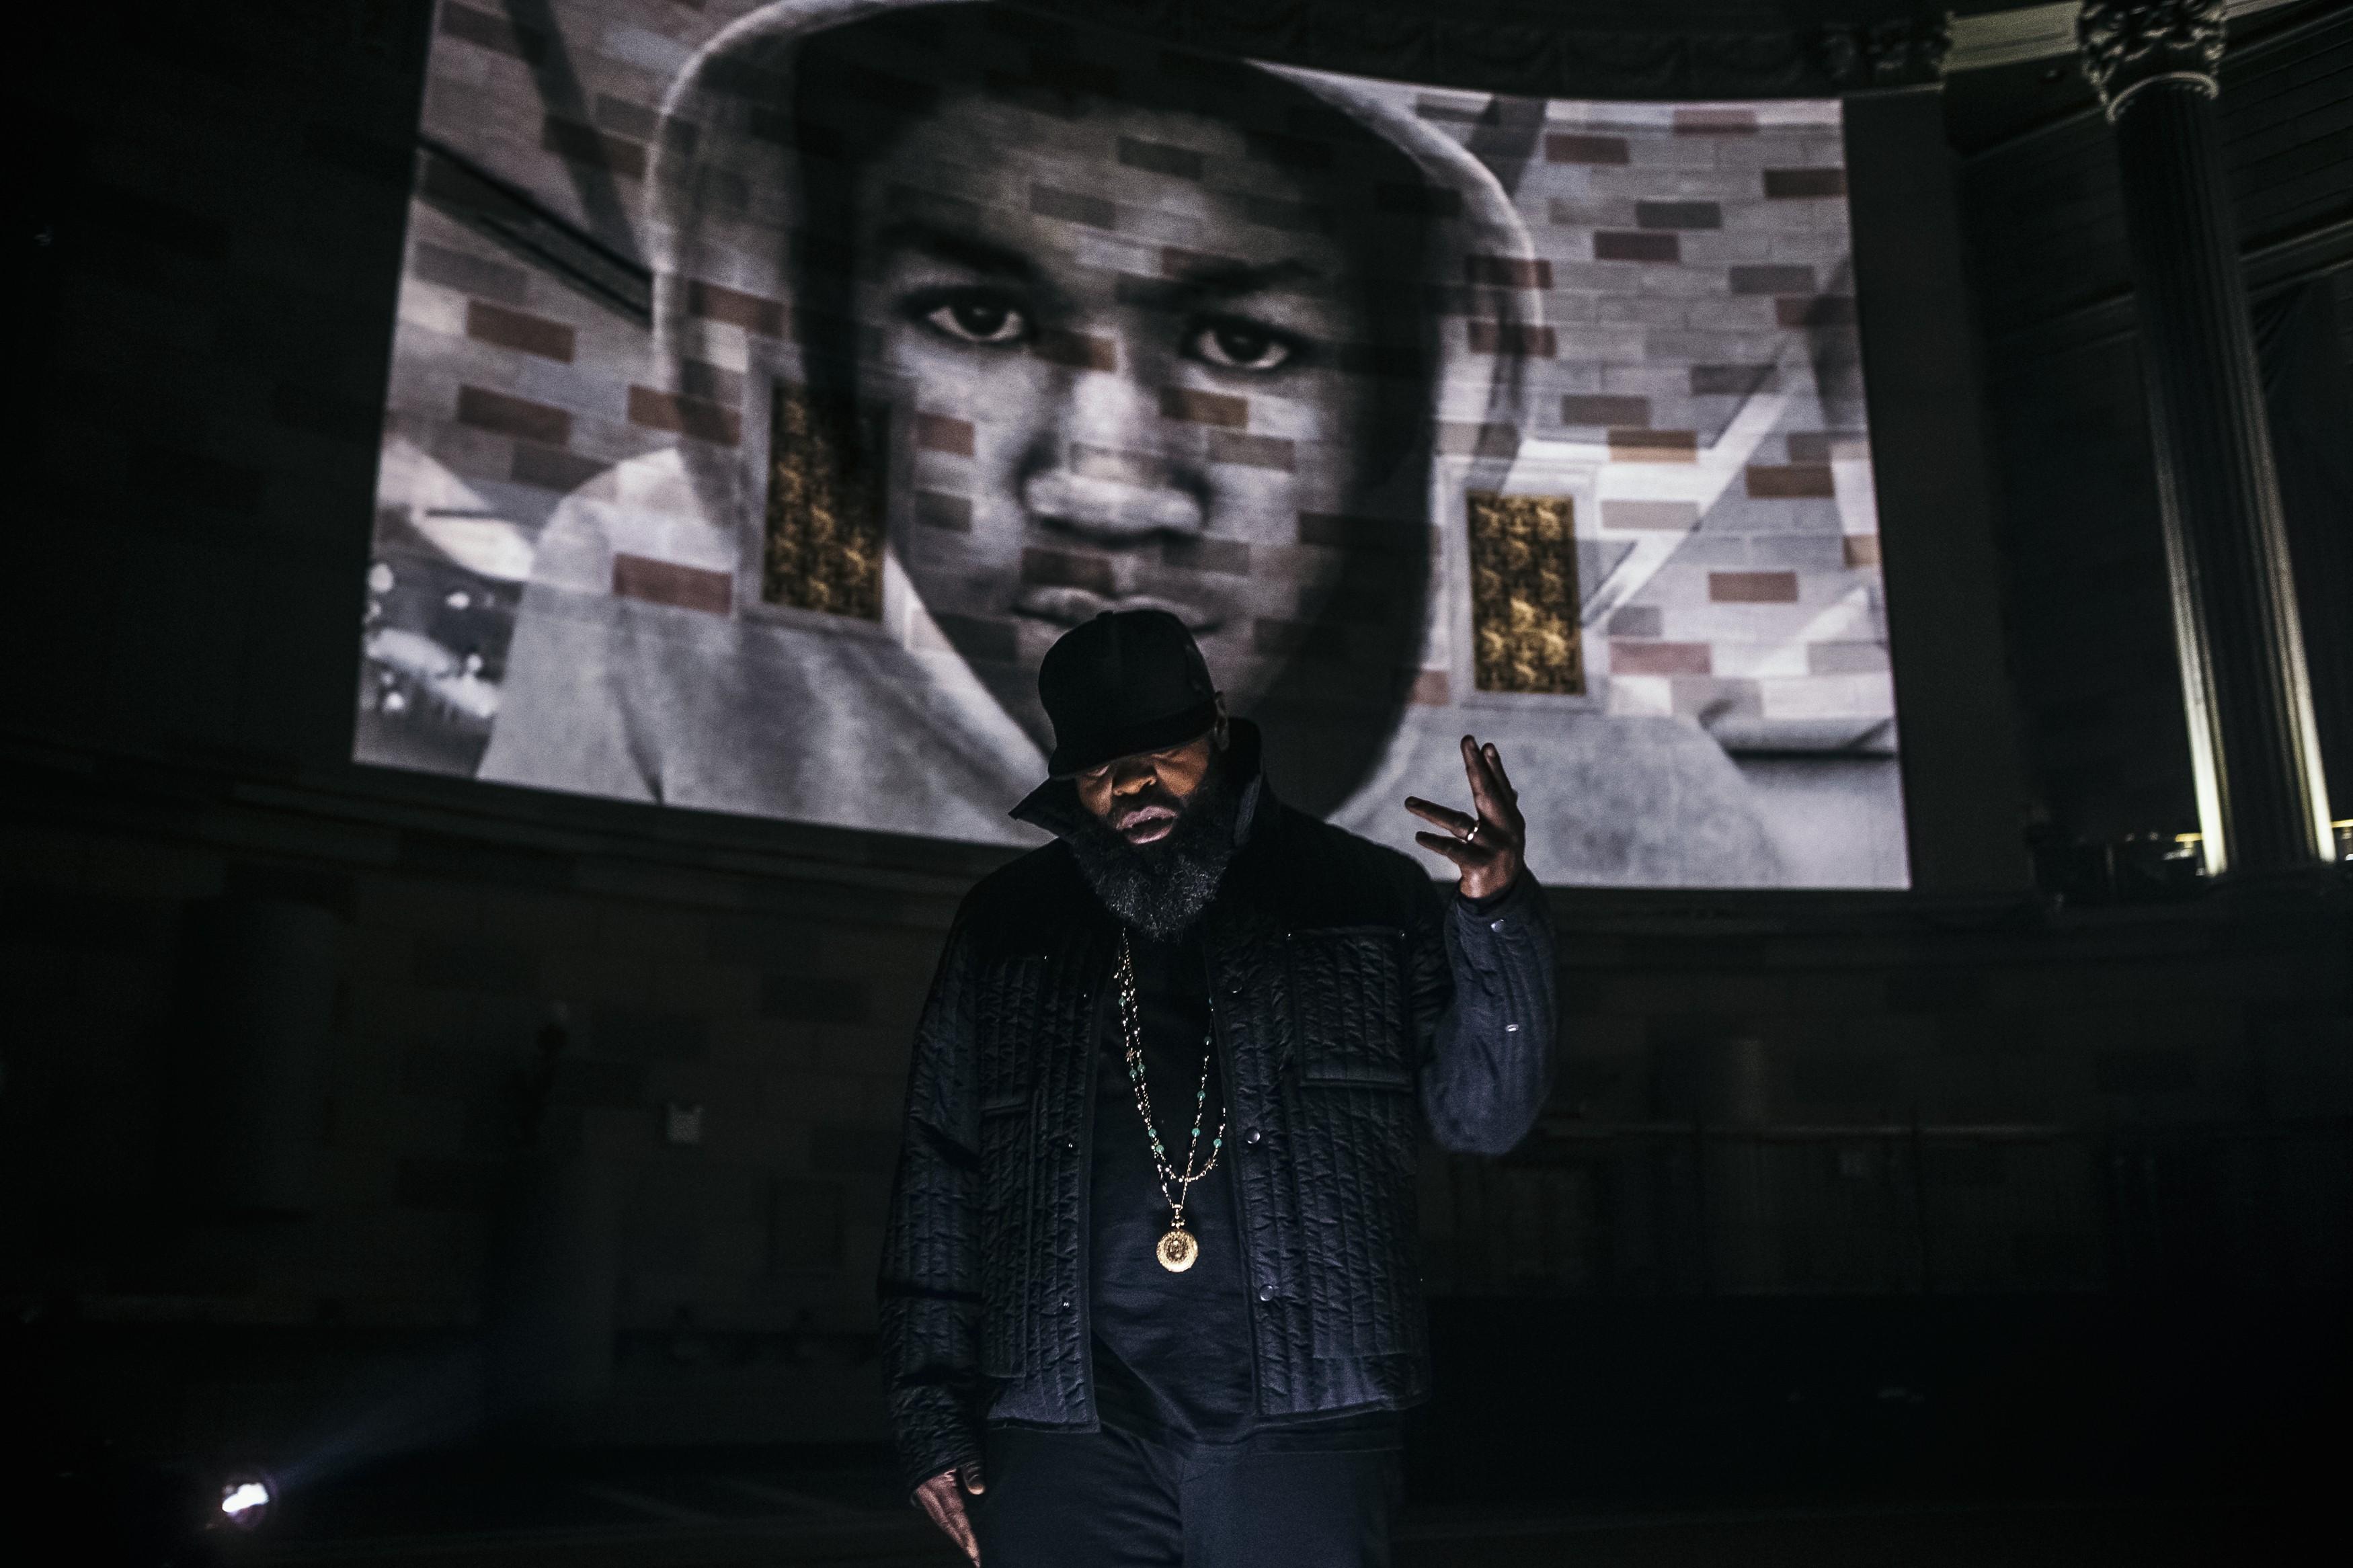 night trayvon martin died - HD3500×2333